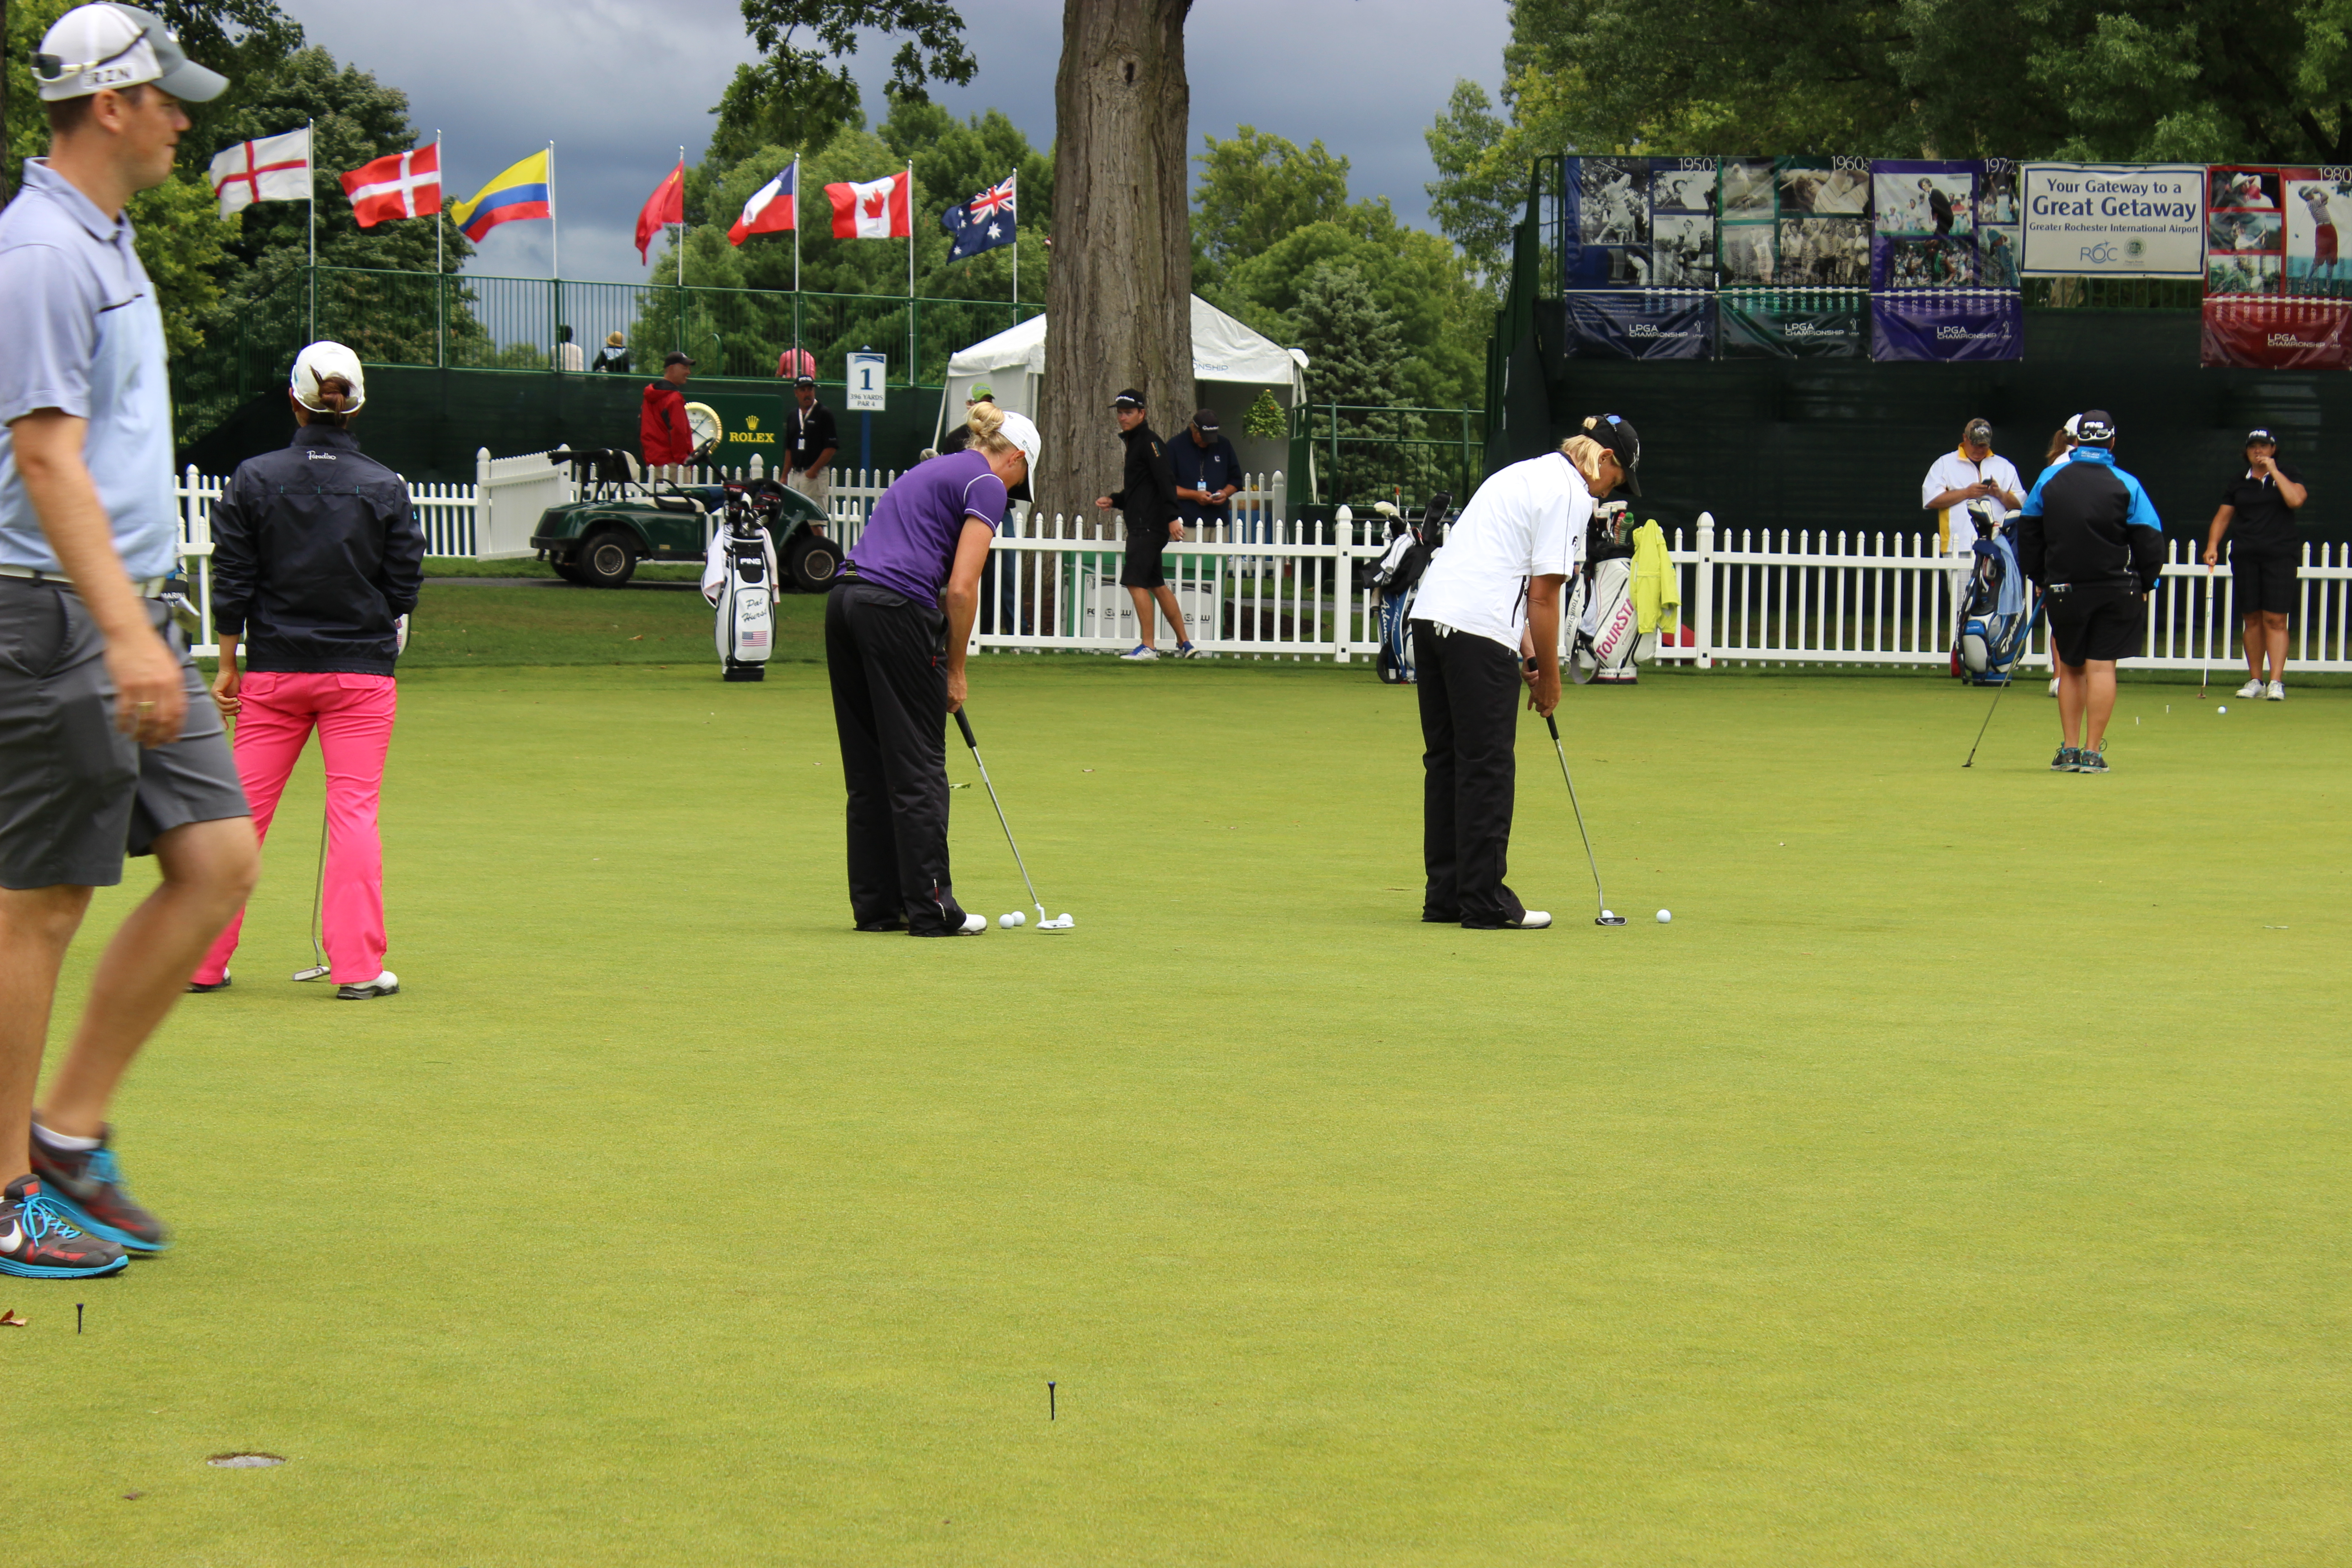 Life-Styles-with-Pretty- Price-Wegmans-LPGA- Championship-Practice-Round-12